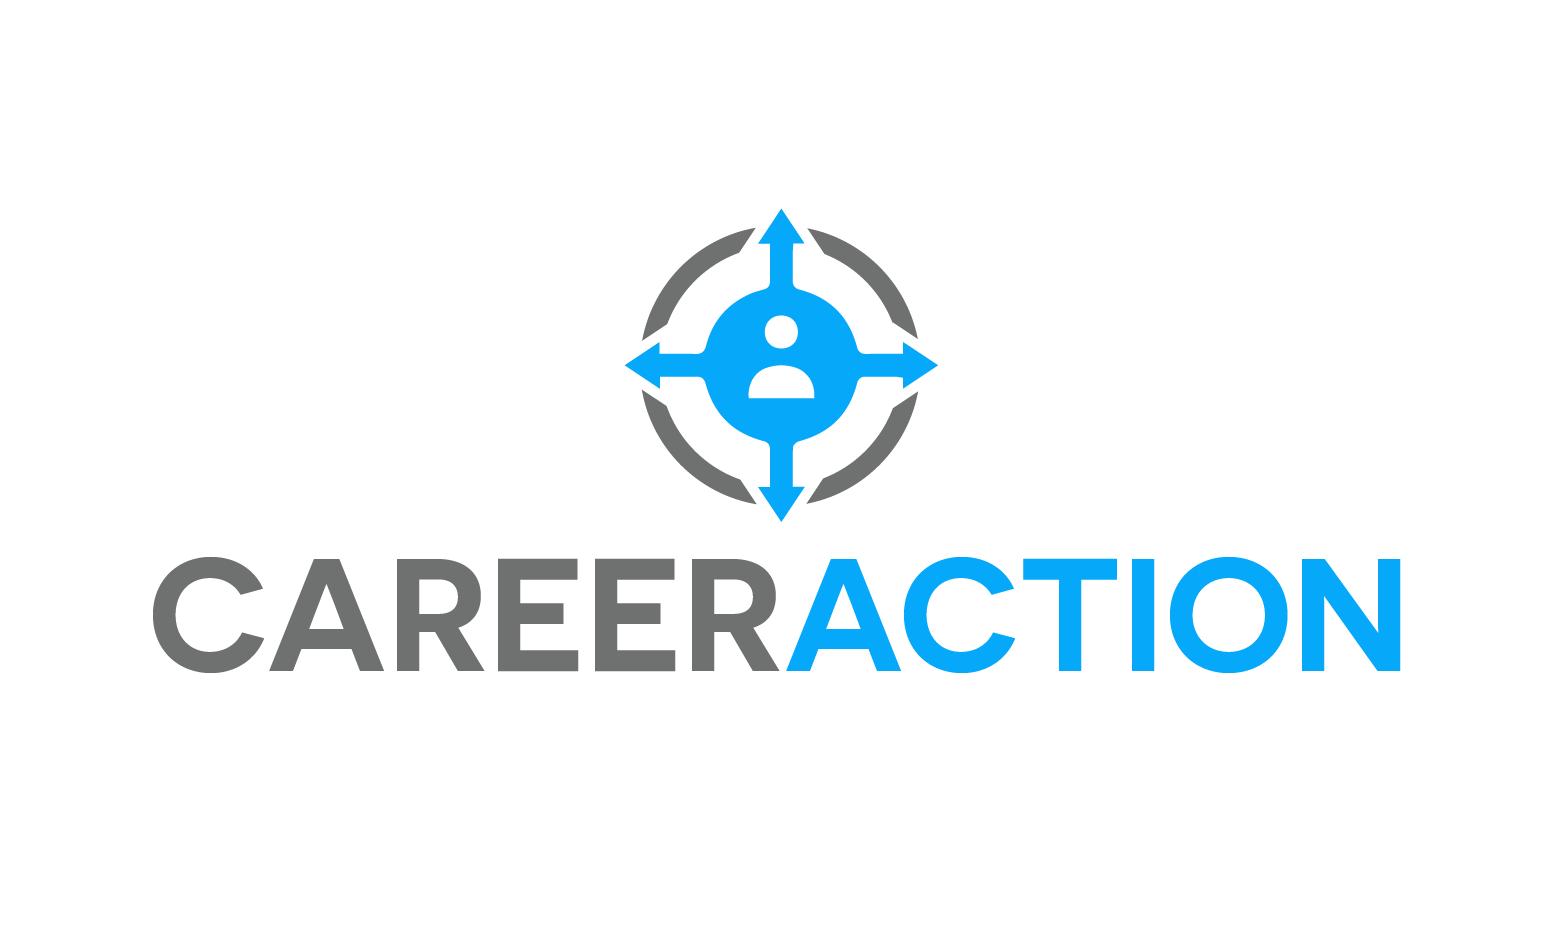 CareerAction.com